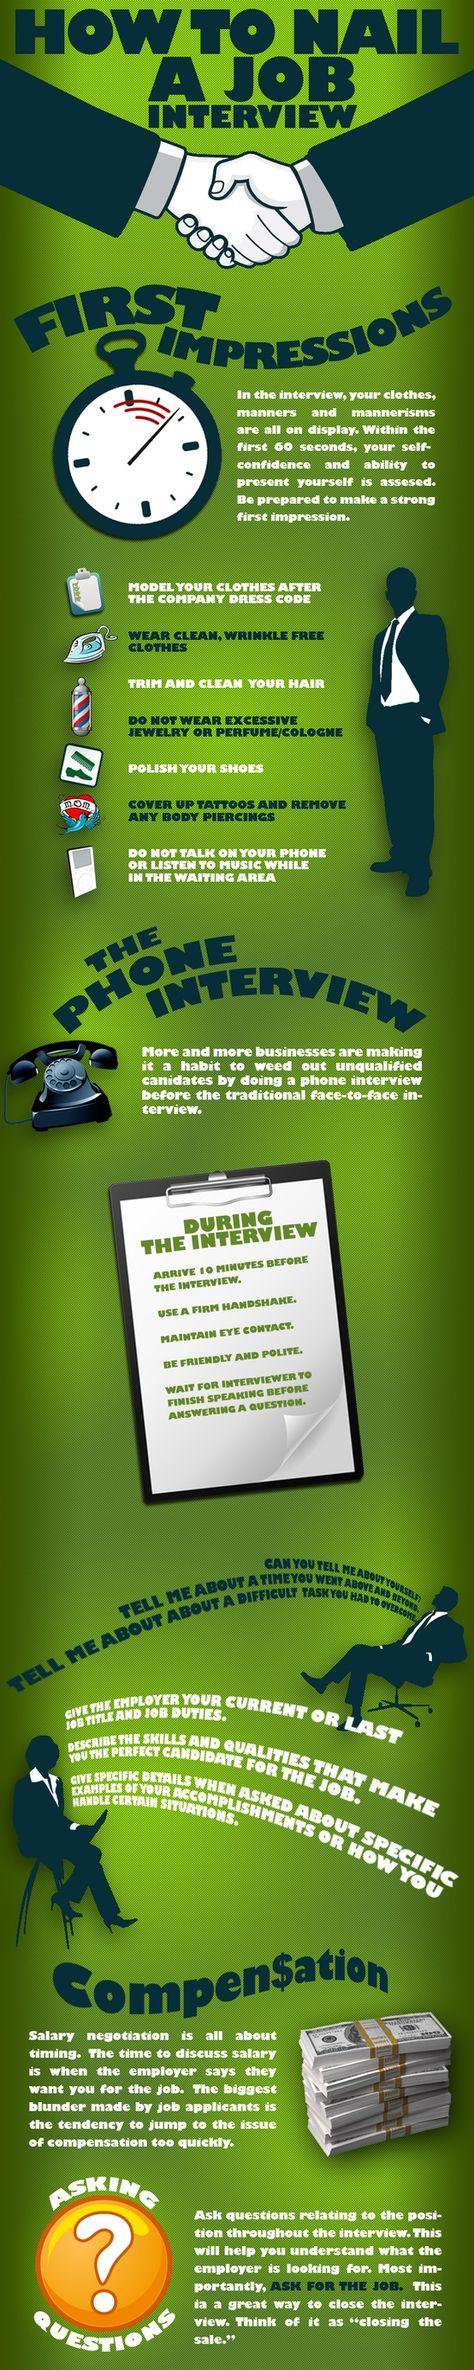 How To Nail A Job Interview #career #jobinterview @profiliacv @cvmontreal